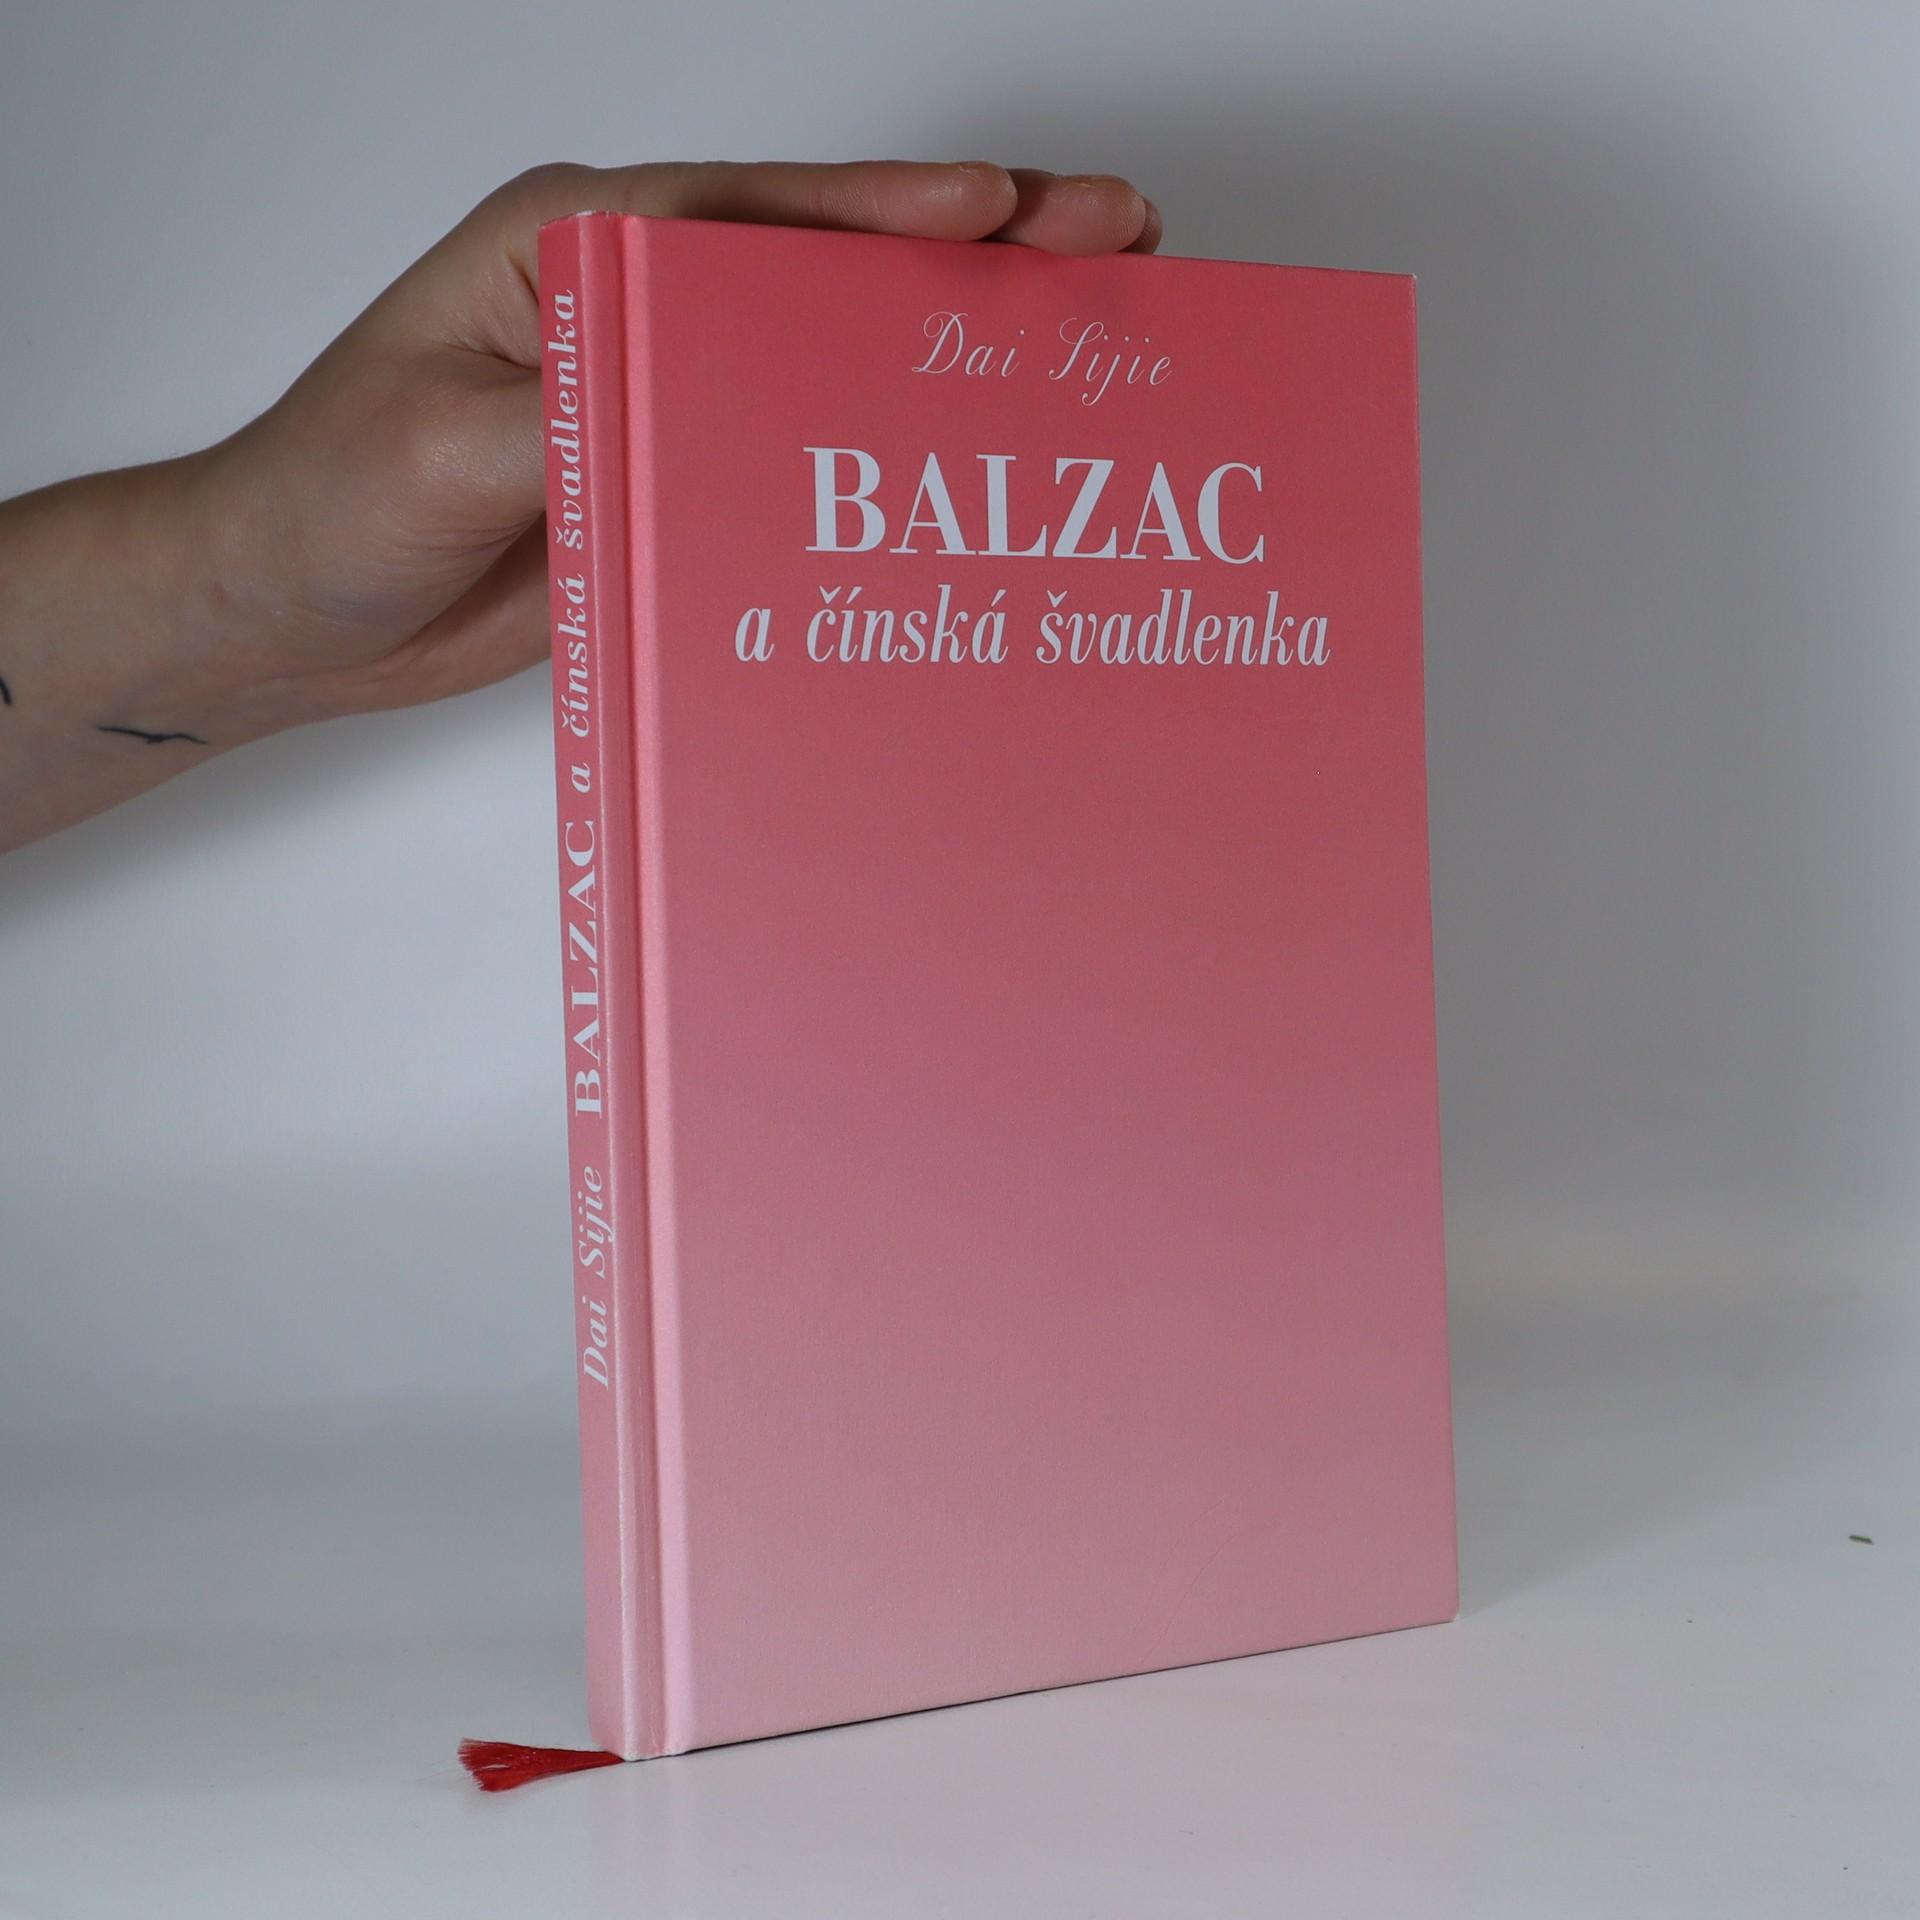 antikvární kniha Balzac a čínská Švadlenka, 2005